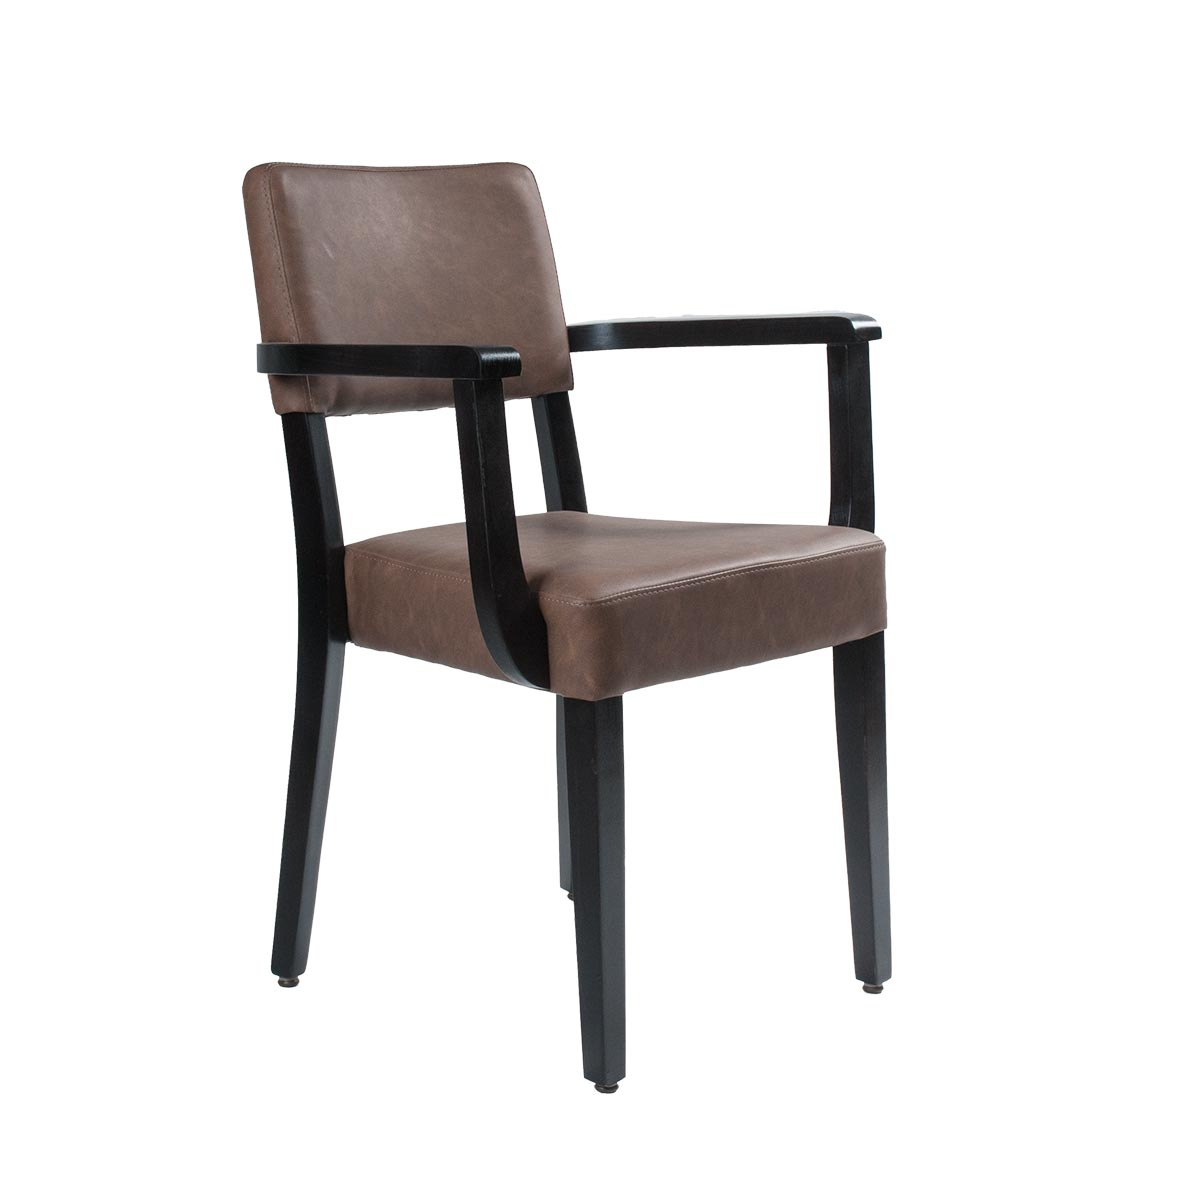 Linn Arm fotelja - Detal proizvodnja nameštaja